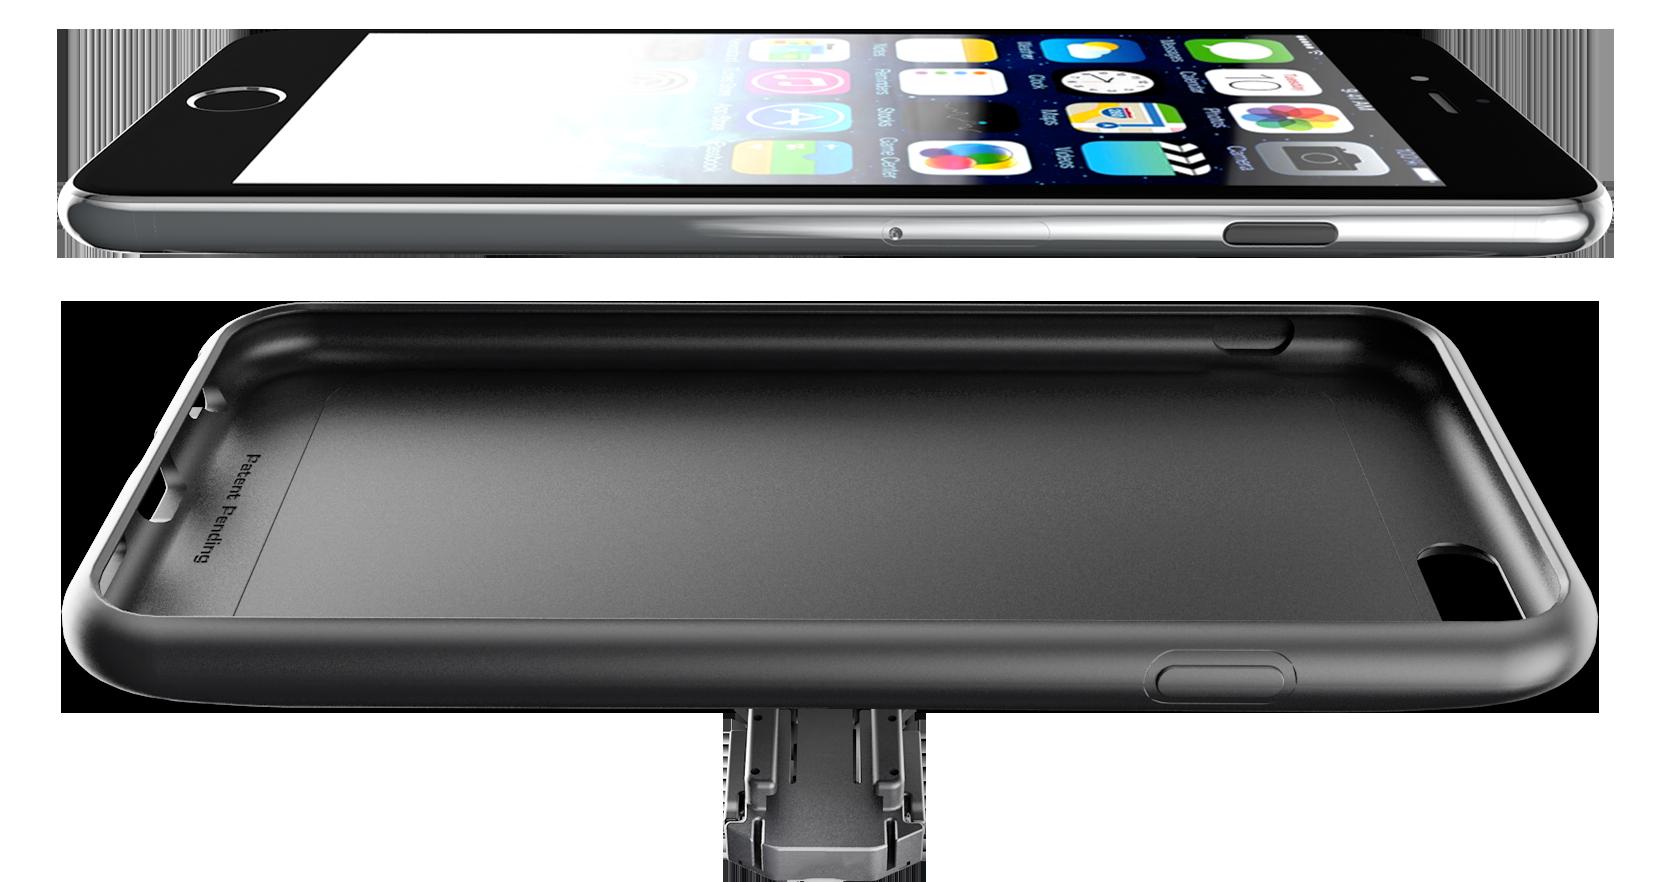 Pouzdro SP CONNECT Phone Case Set Samsung Galaxy S7 Edge